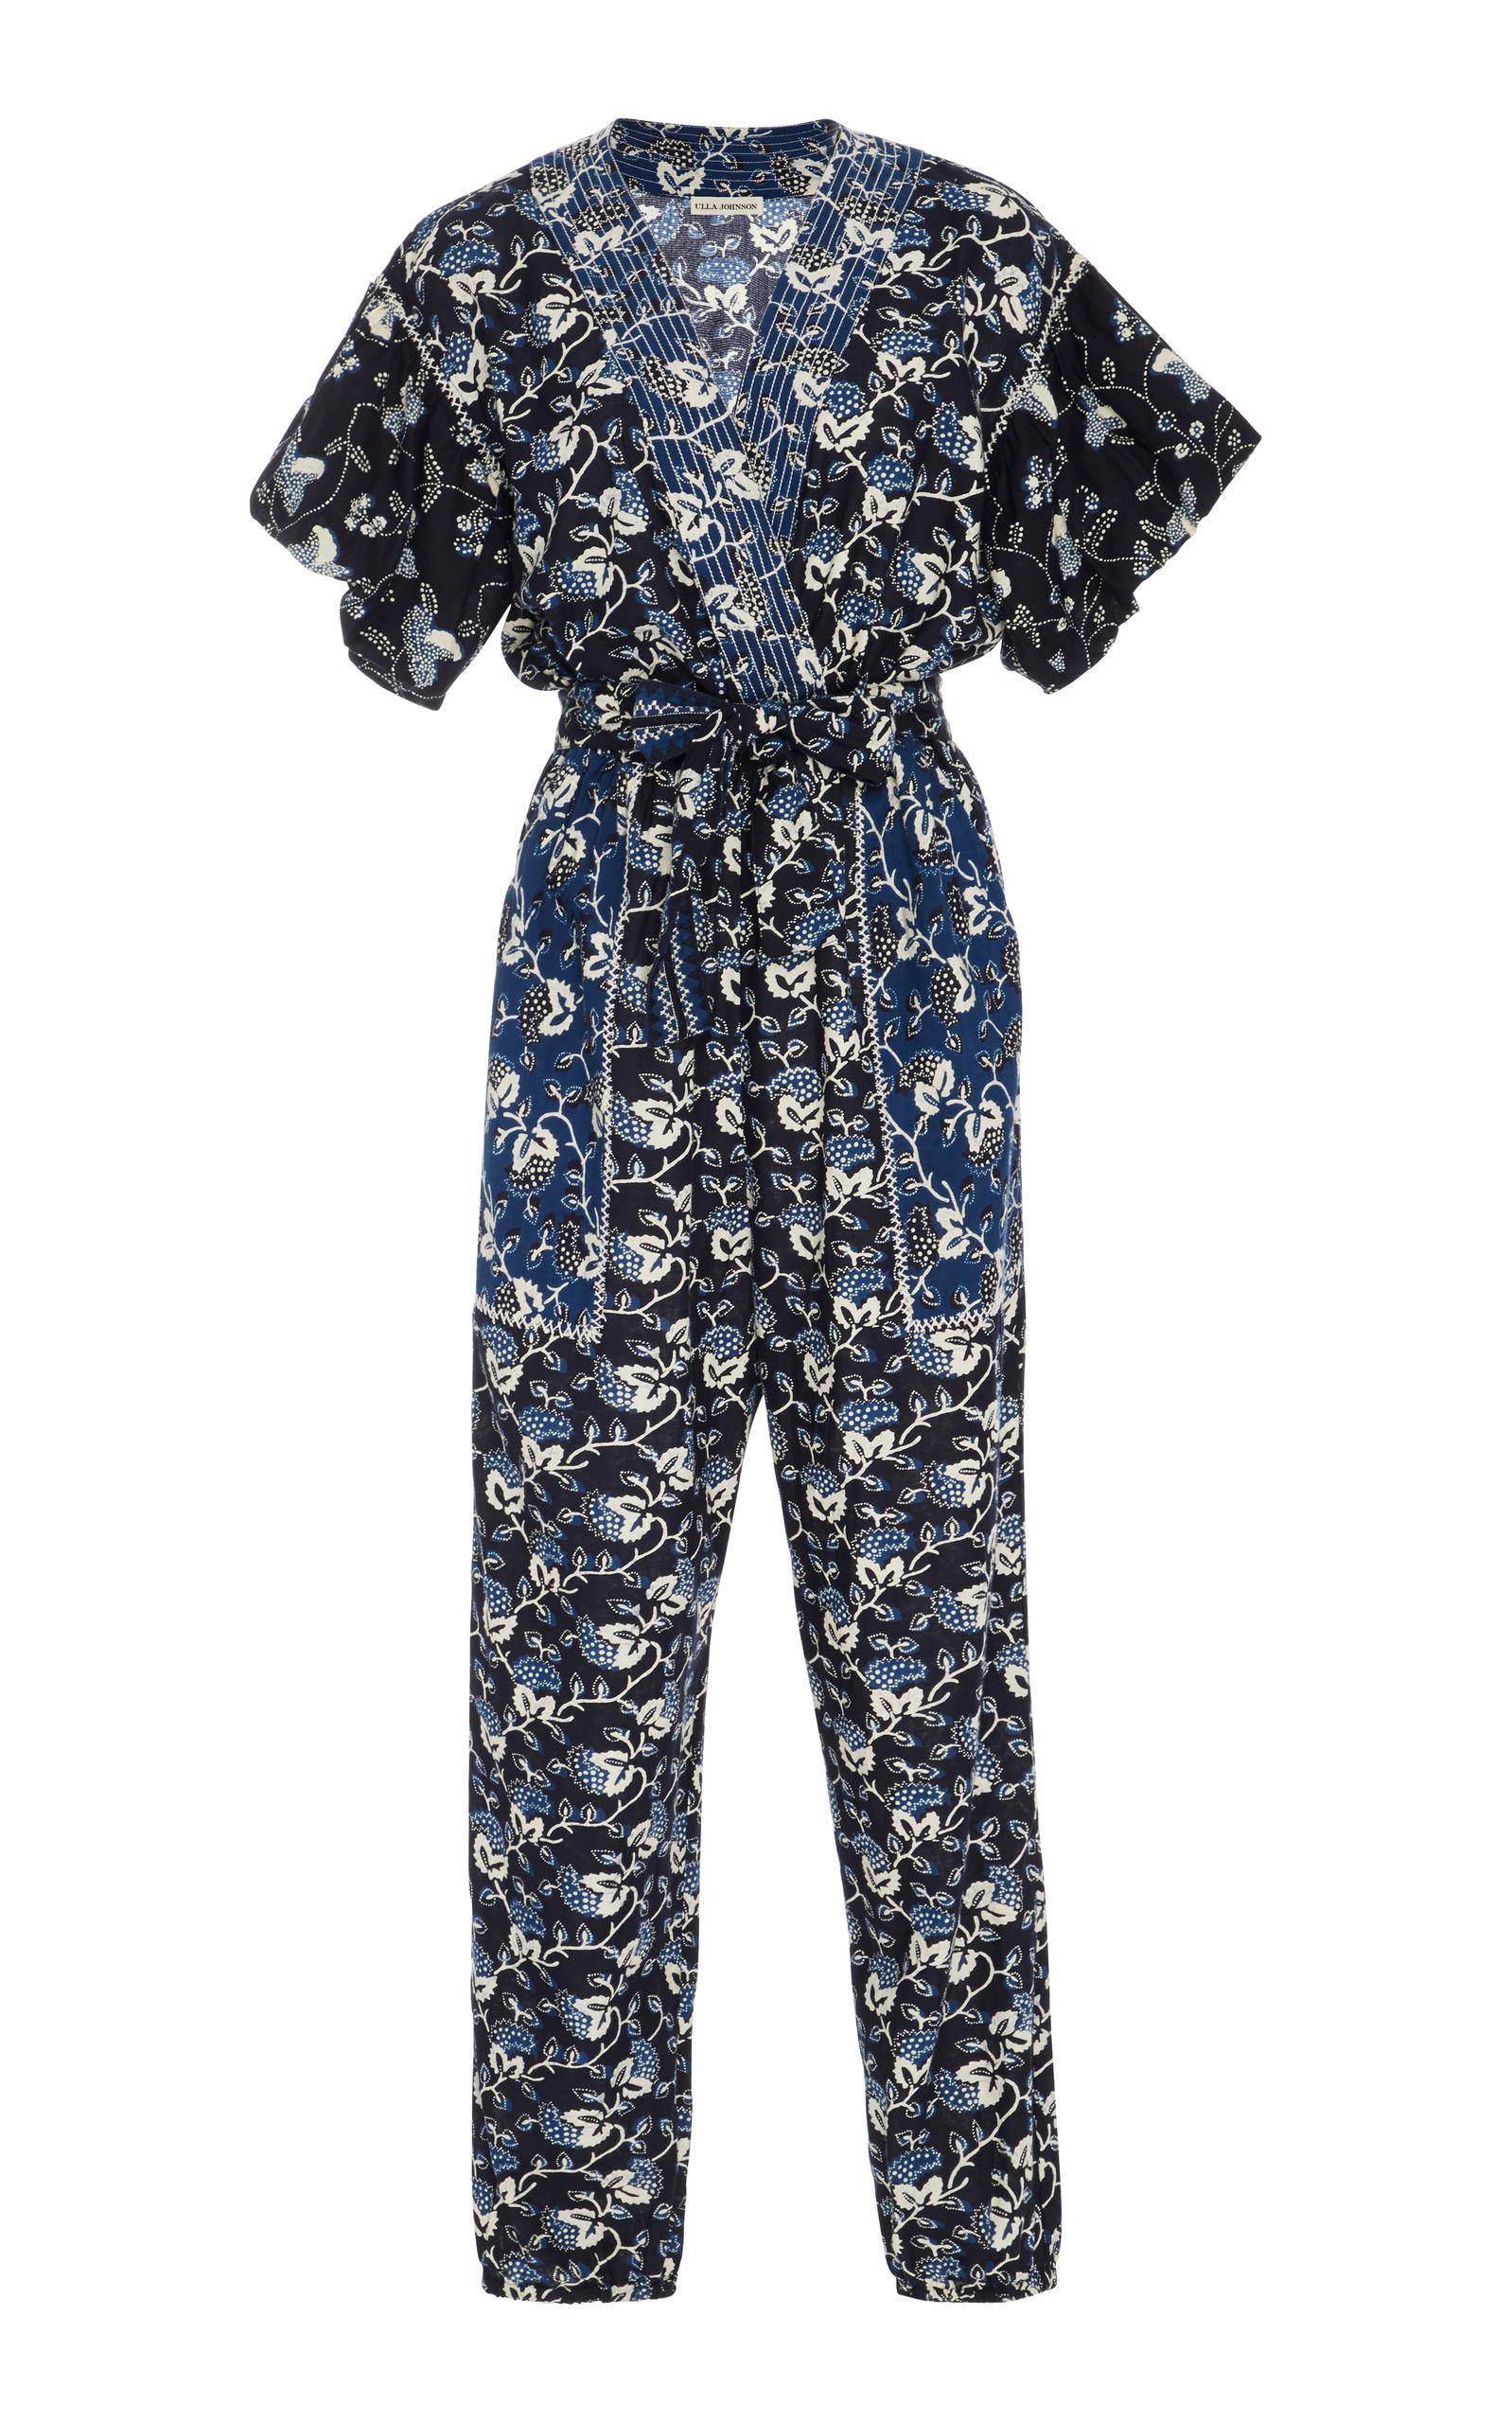 711b4f3cab94 Lyst - Ulla Johnson Reiko Cotton Jumpsuit in Blue